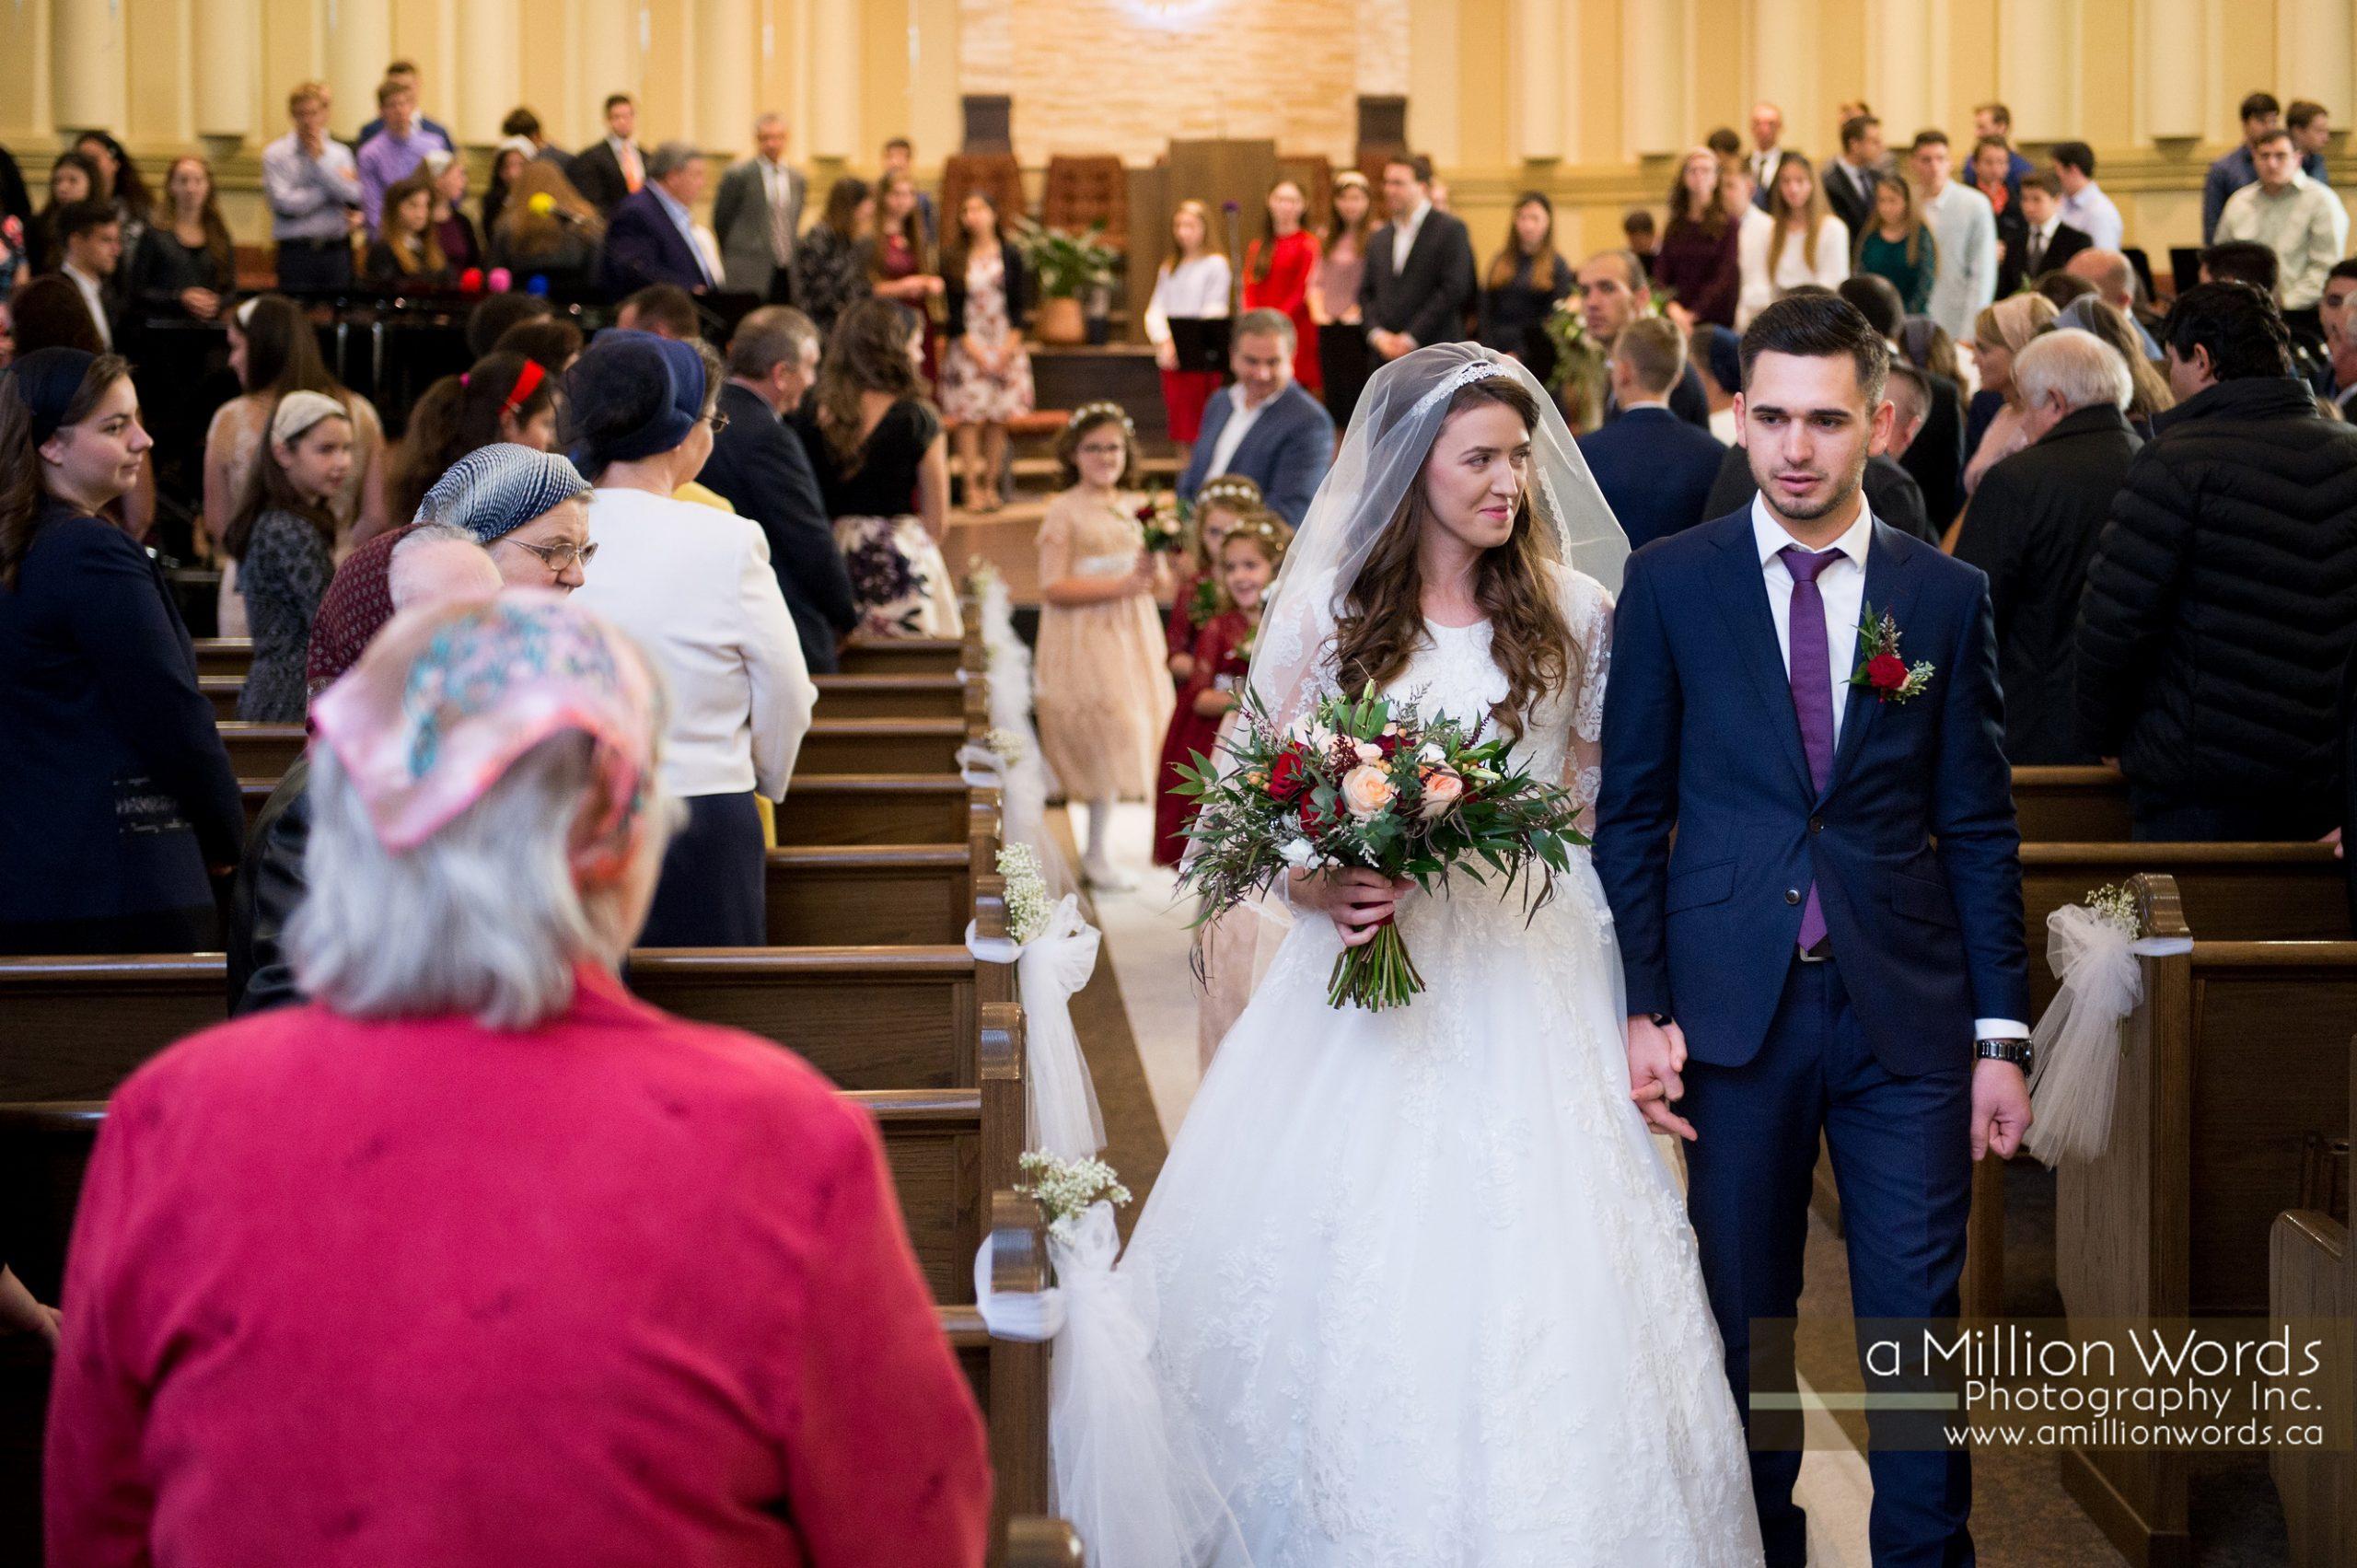 cambridge_afternoon_wedding_photography22